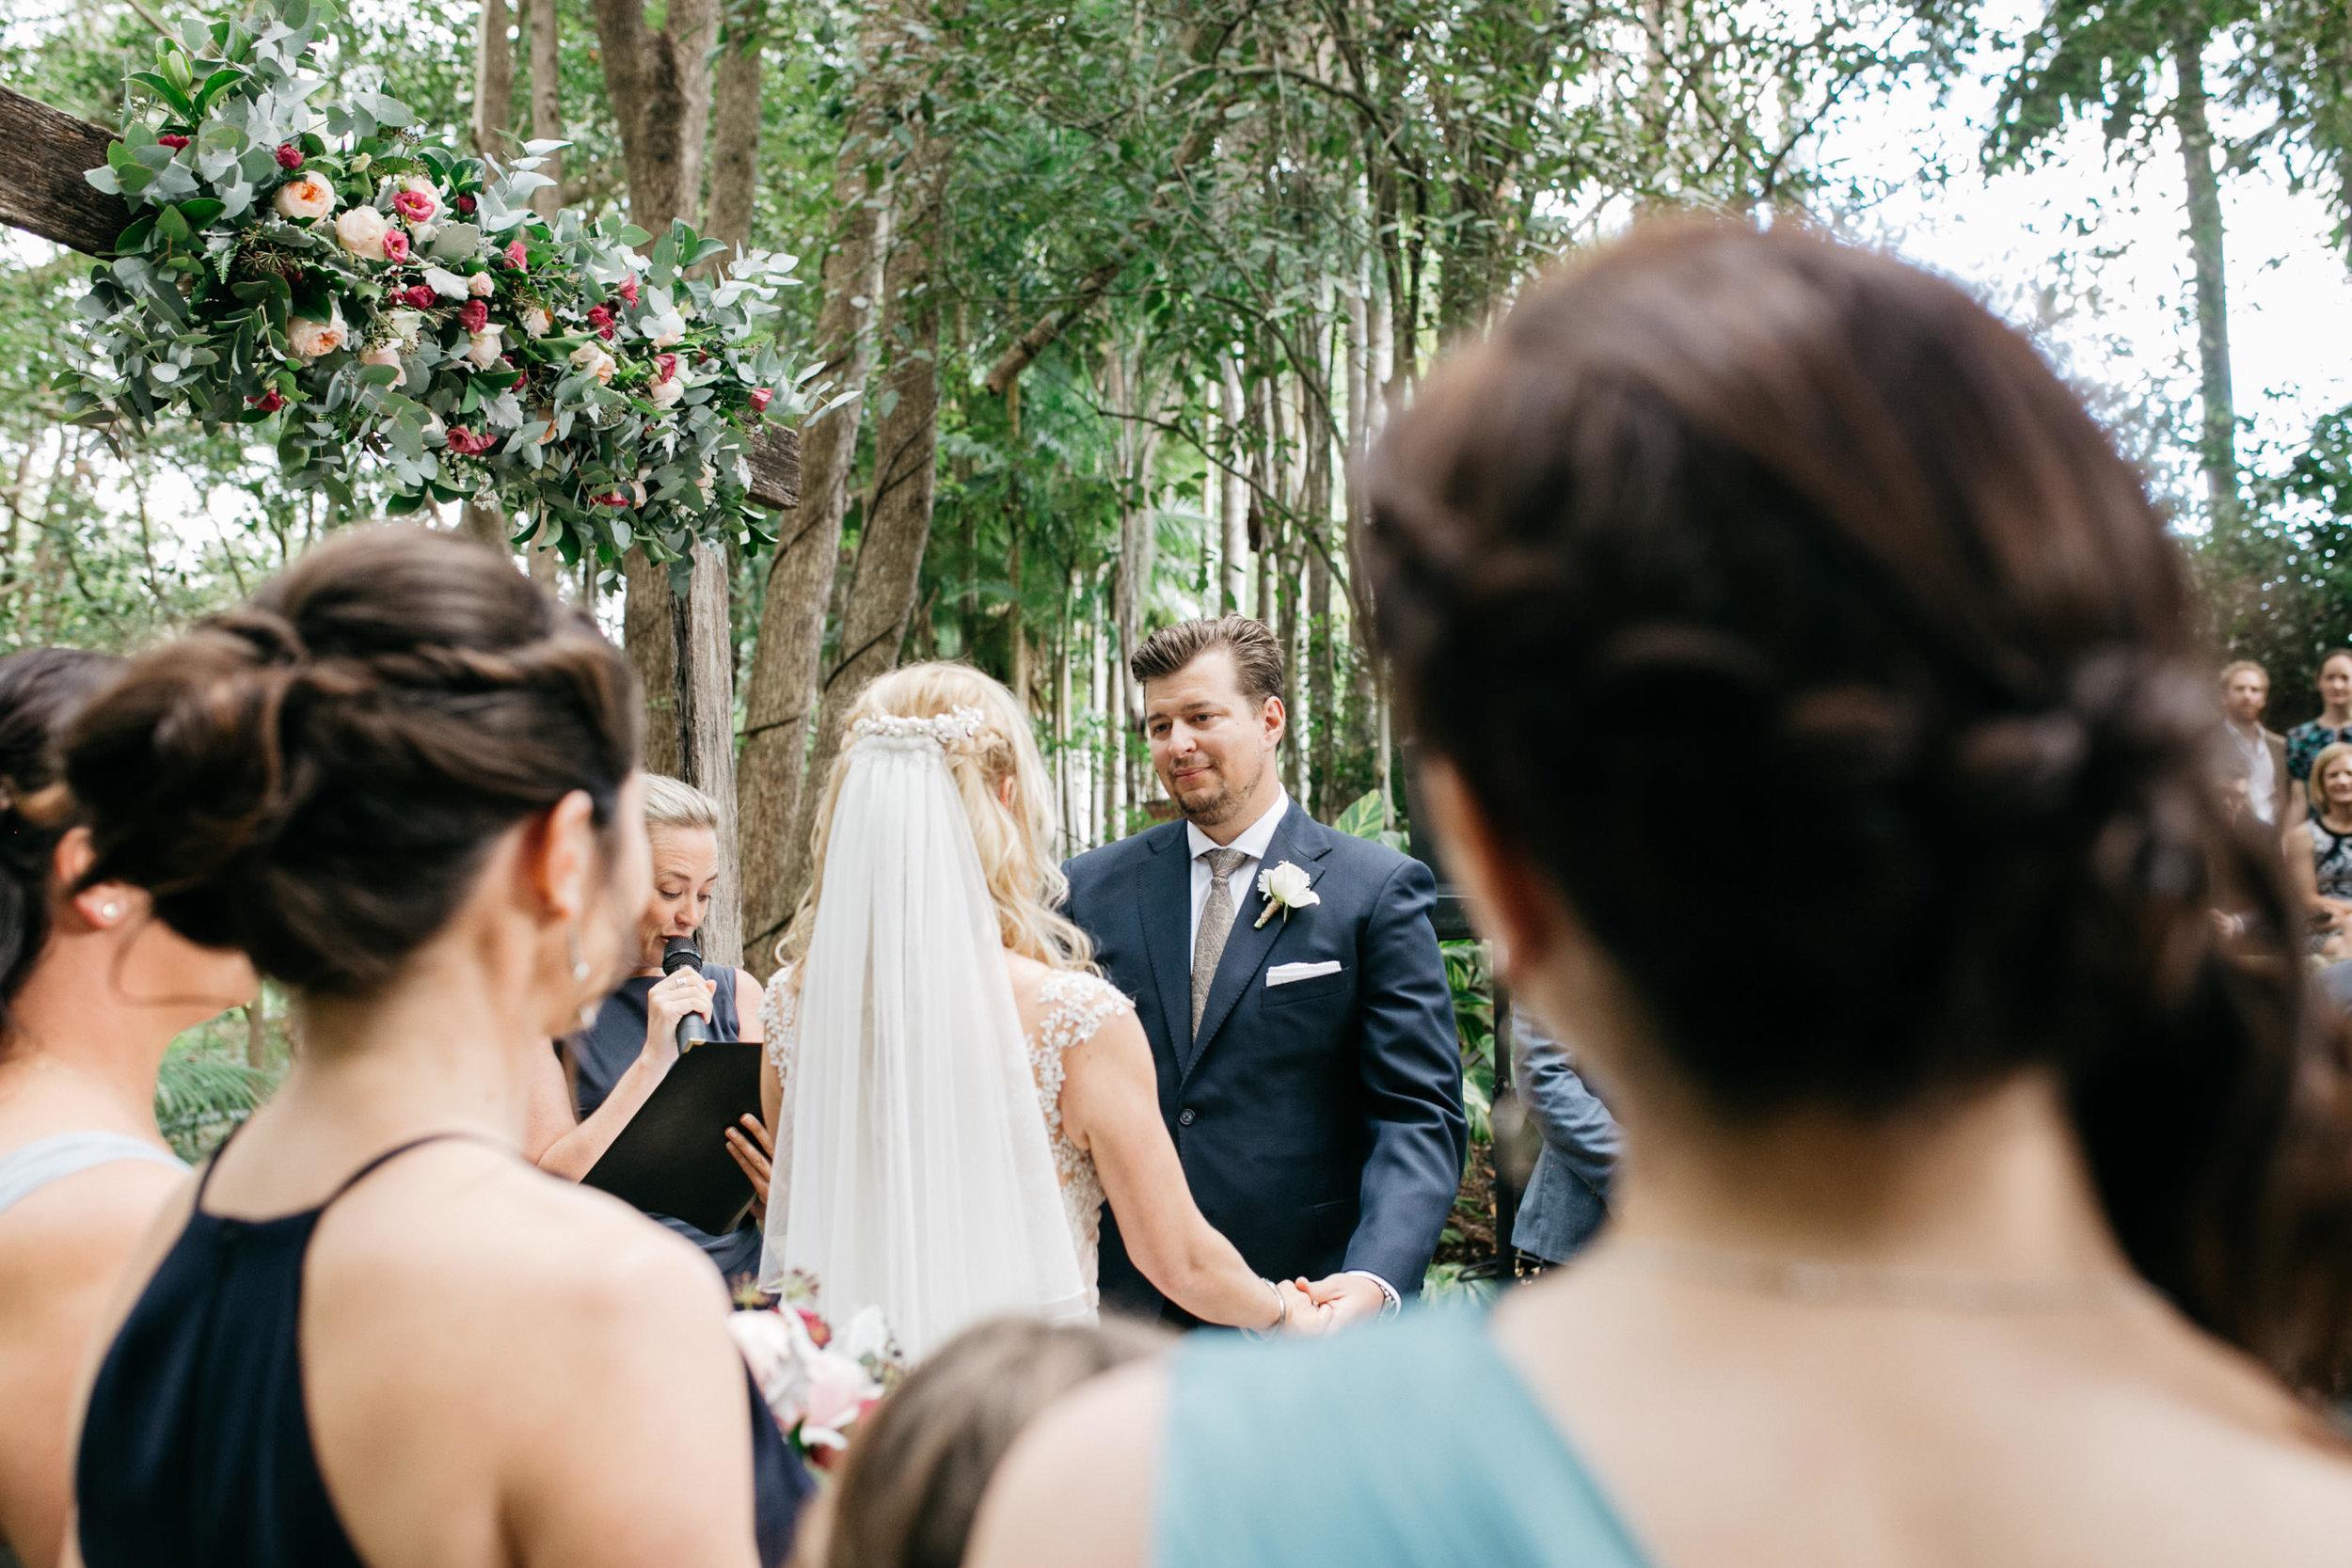 True North Photography_Boomerang Farm_Stacey and Isaac_Gold Coast Wedding_Barm Wedding_Hinterland Wedding-87.jpg